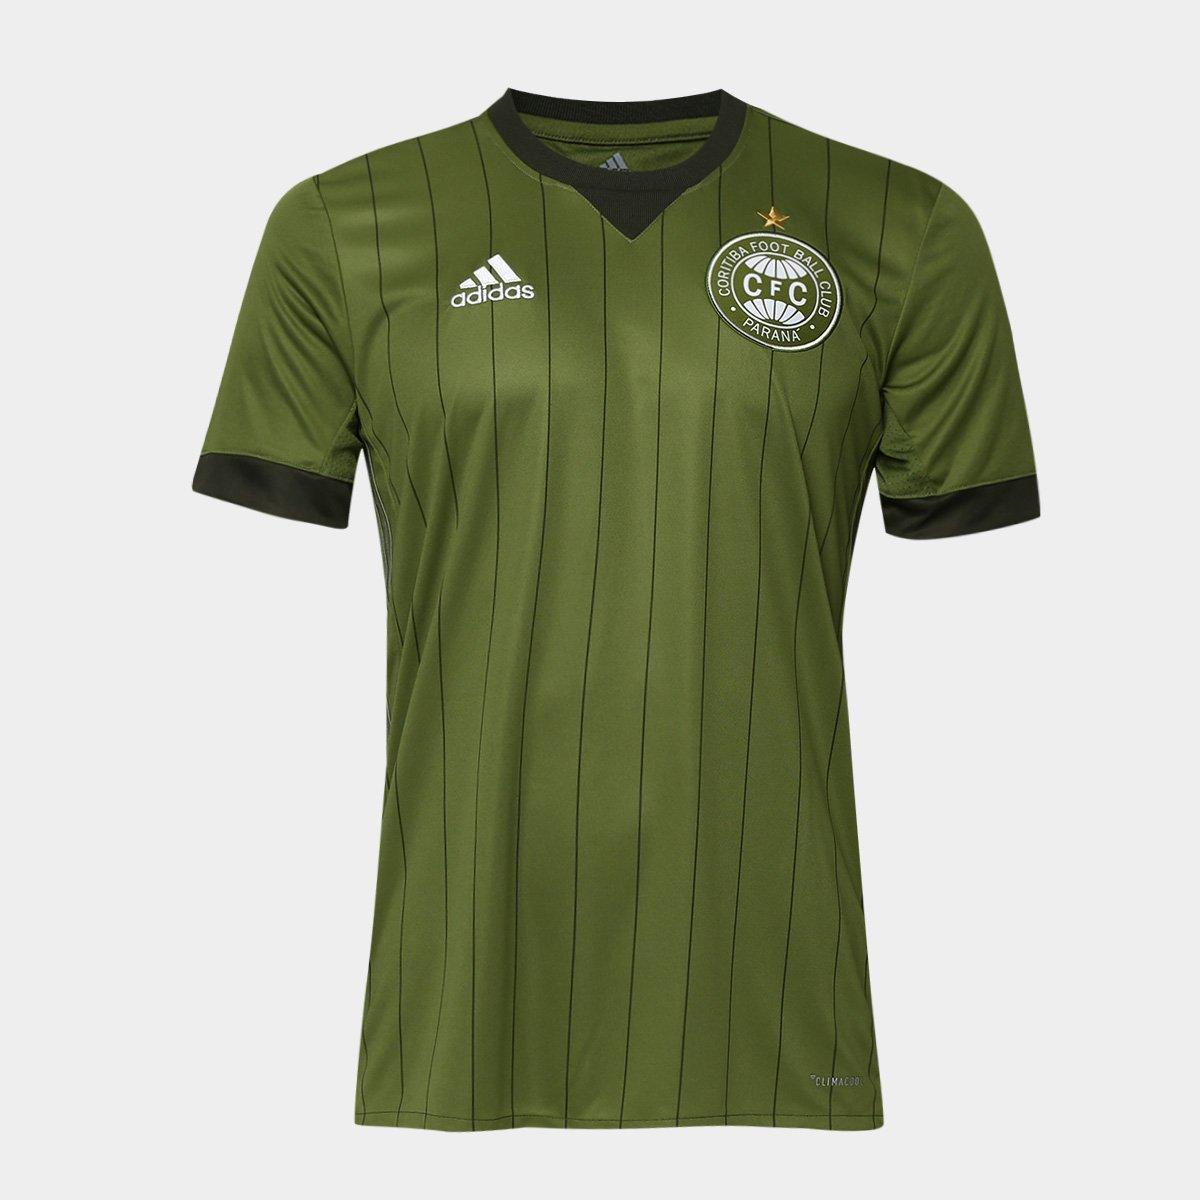 bbc7c53d24 Camisa Coritiba II 17 18 s n° - Torcedor Adidas Masculina